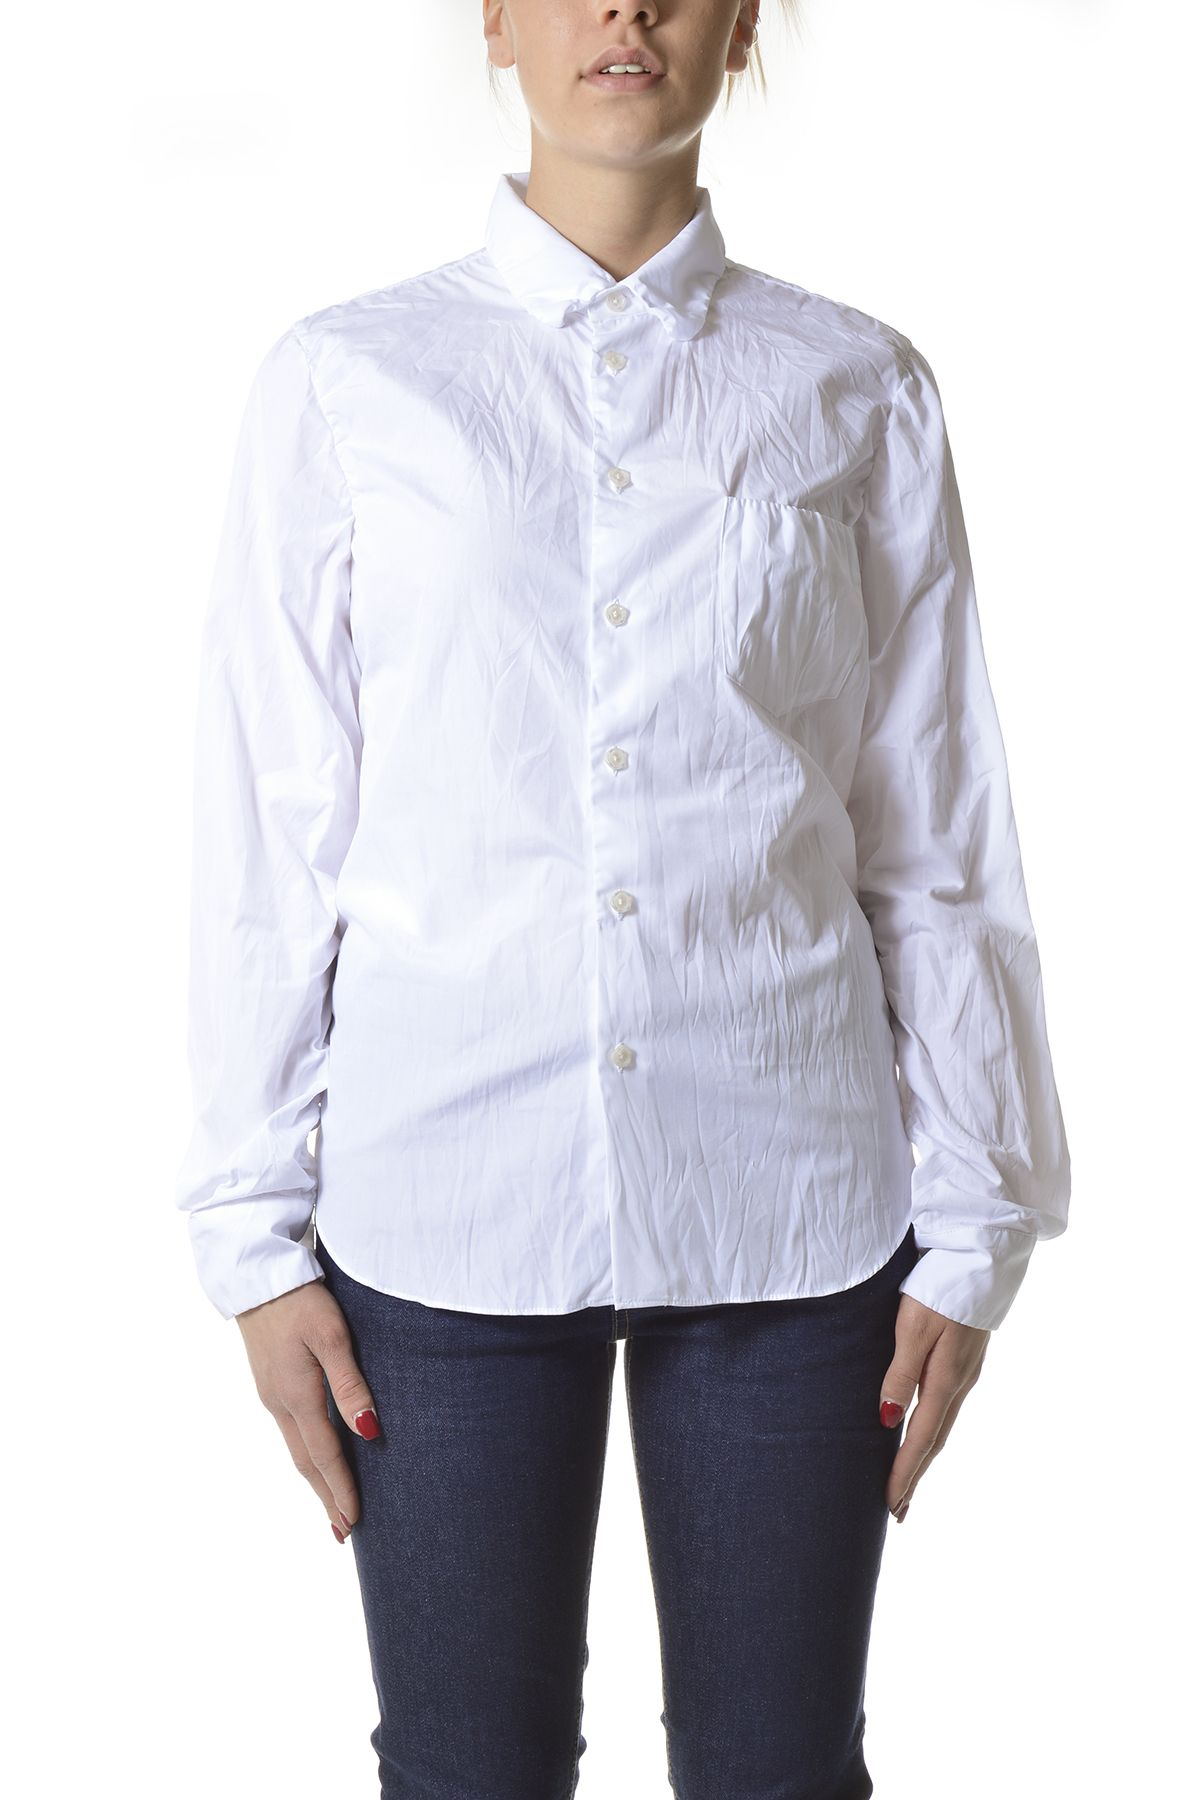 Marni Cottons MARNI WOMEN'S WHITE COTTON SHIRT